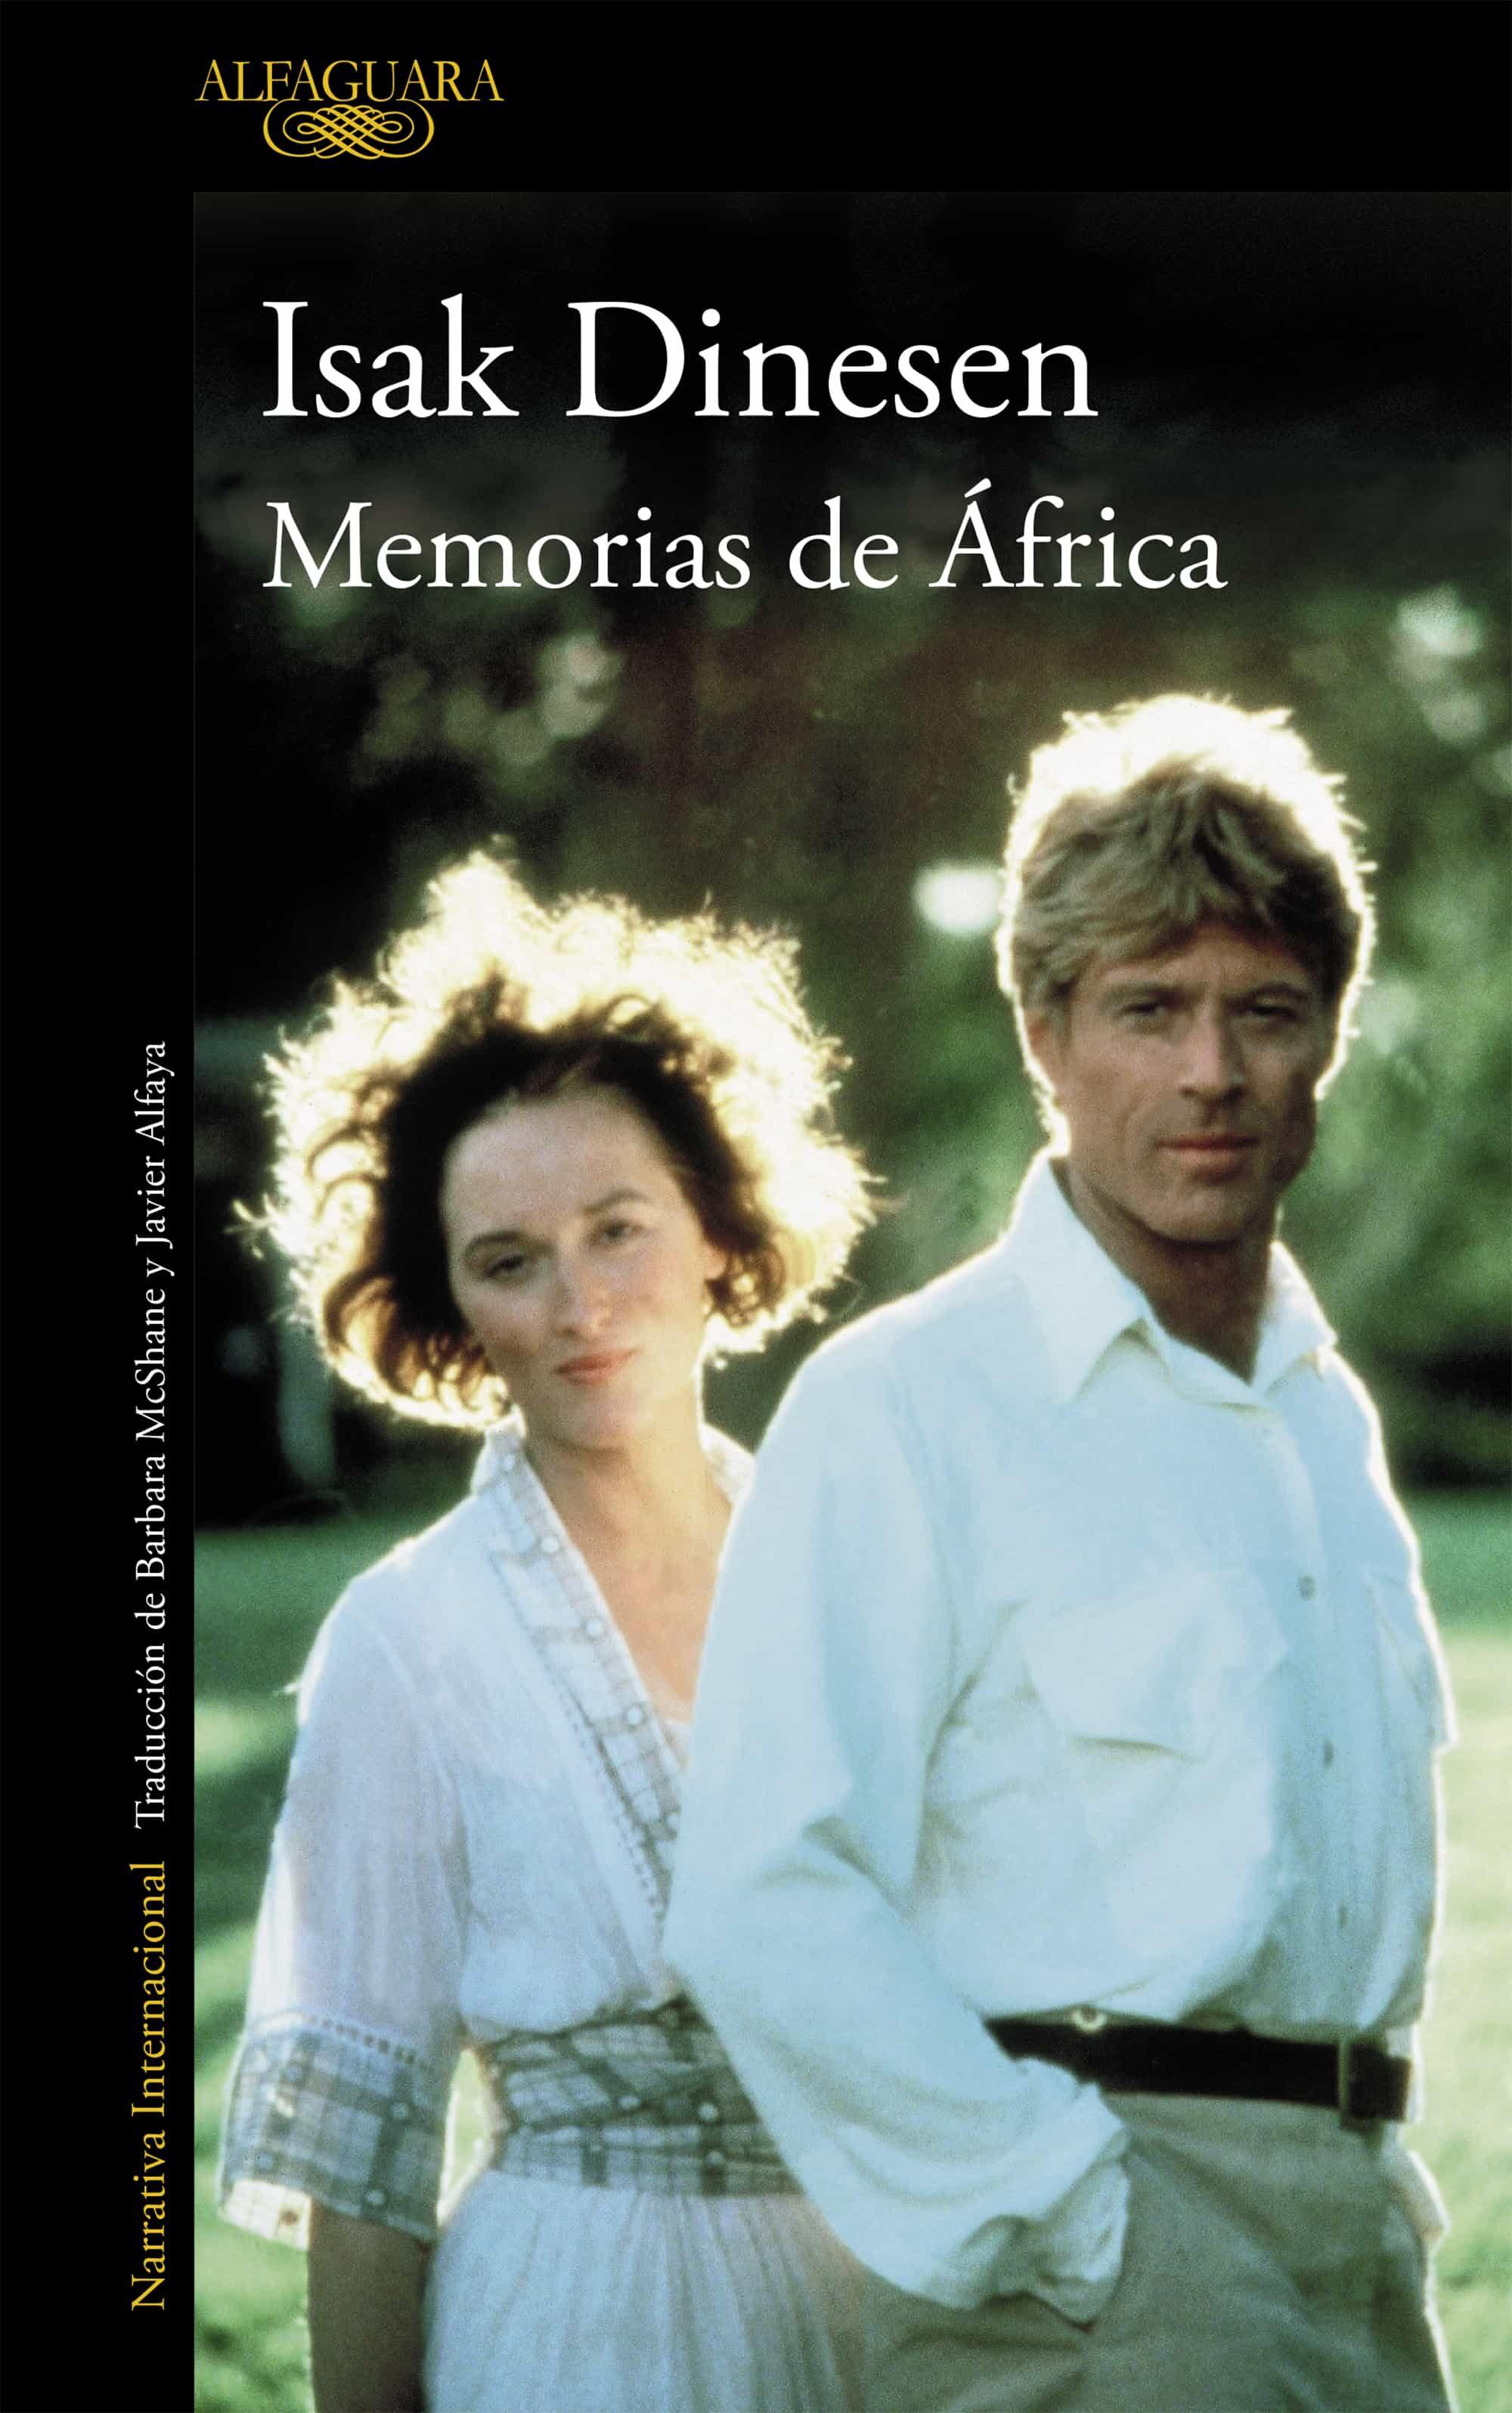 Memorias De Africa por Isak Dinesen